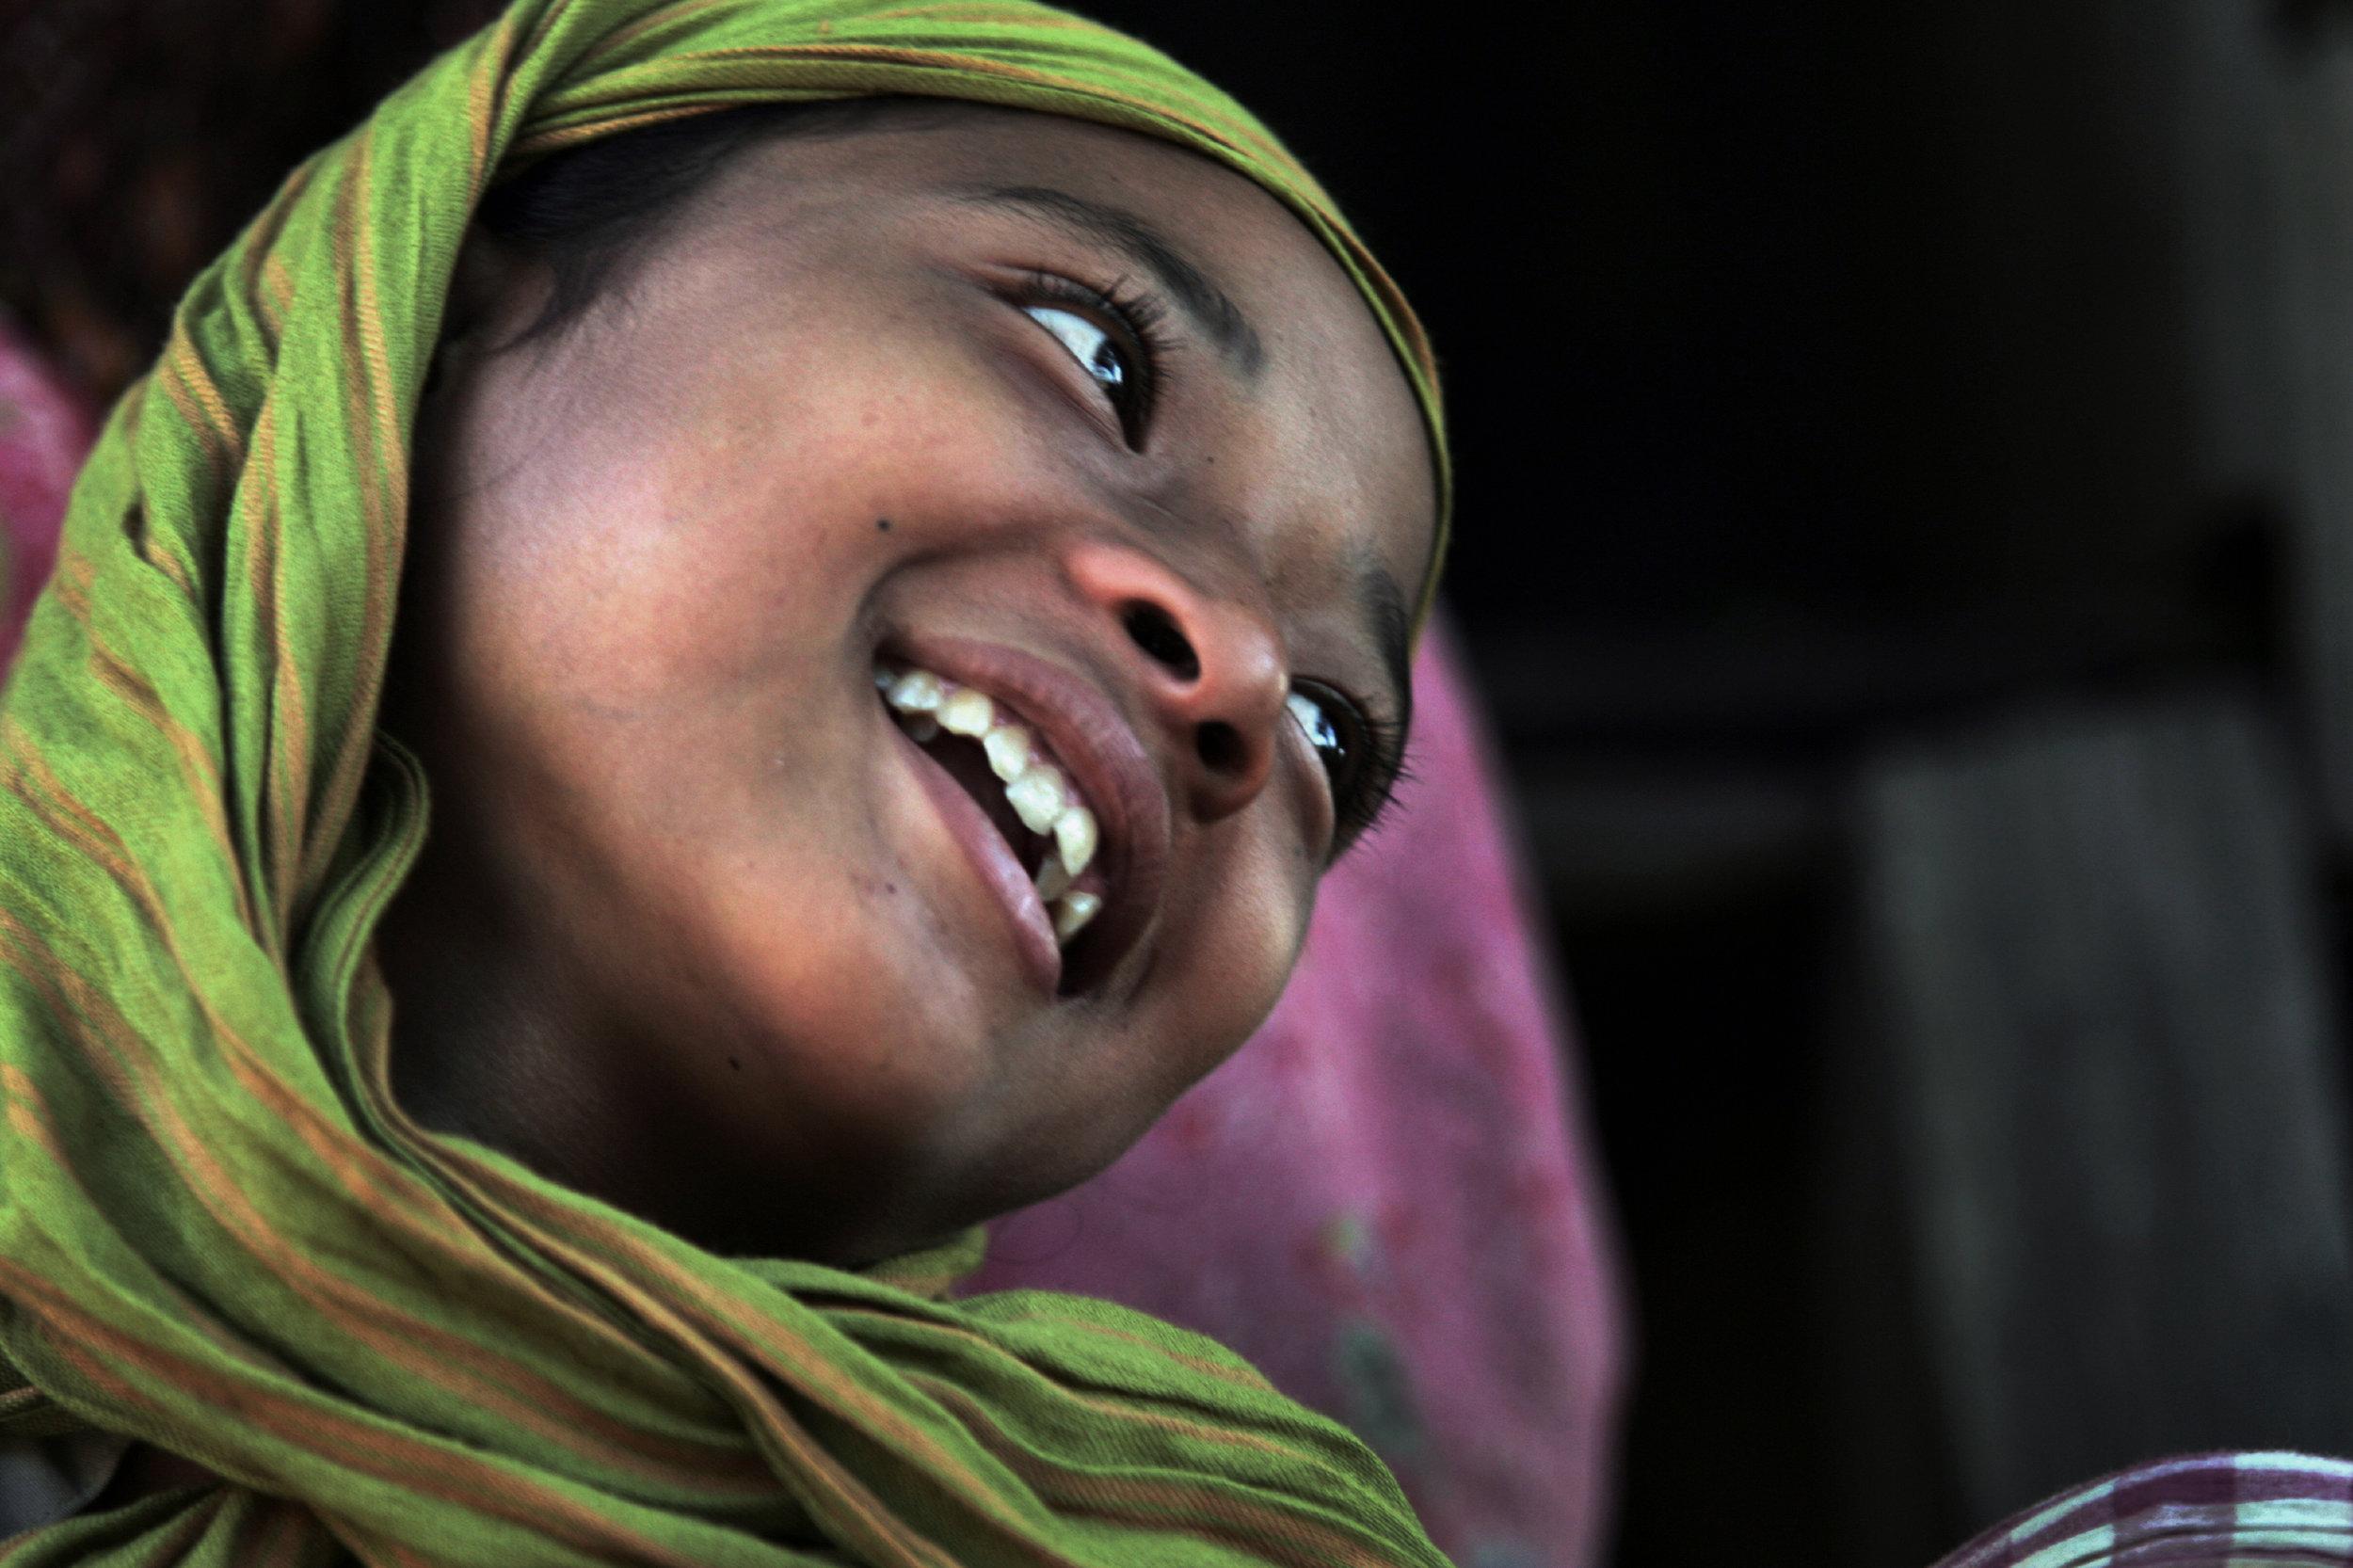 """Joie De Vivre."" Loveathon, Cambodia 2009"